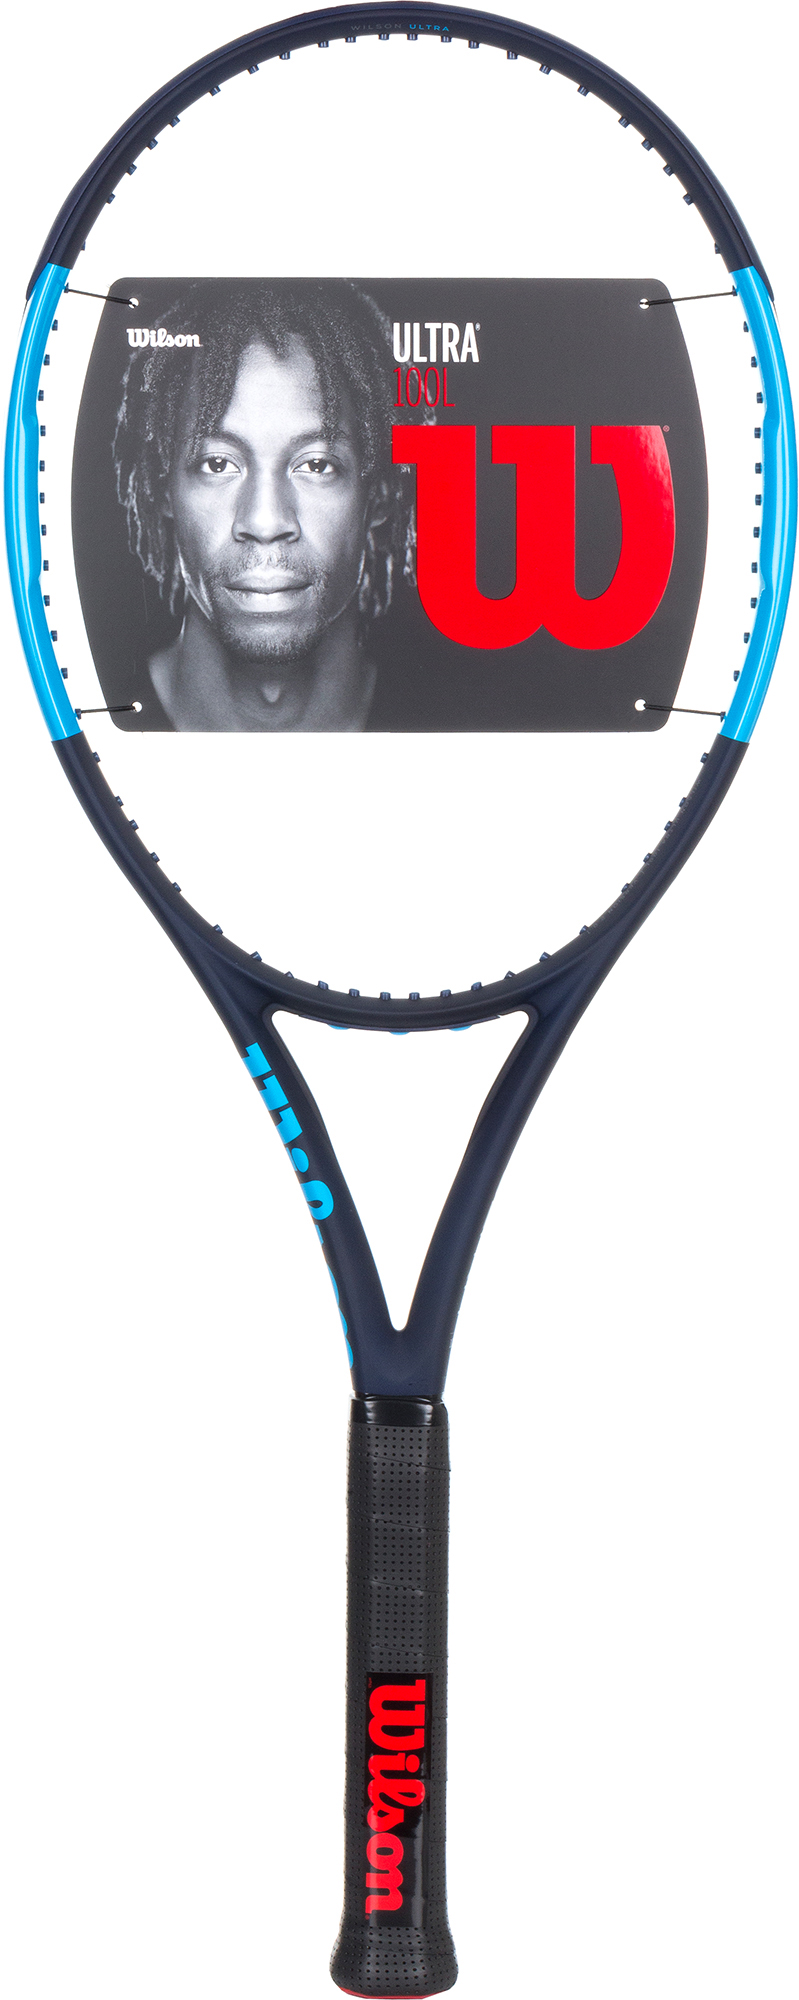 Wilson Ракетка для большого тенниса Wilson Ultra 100L сетки для тенниса большого